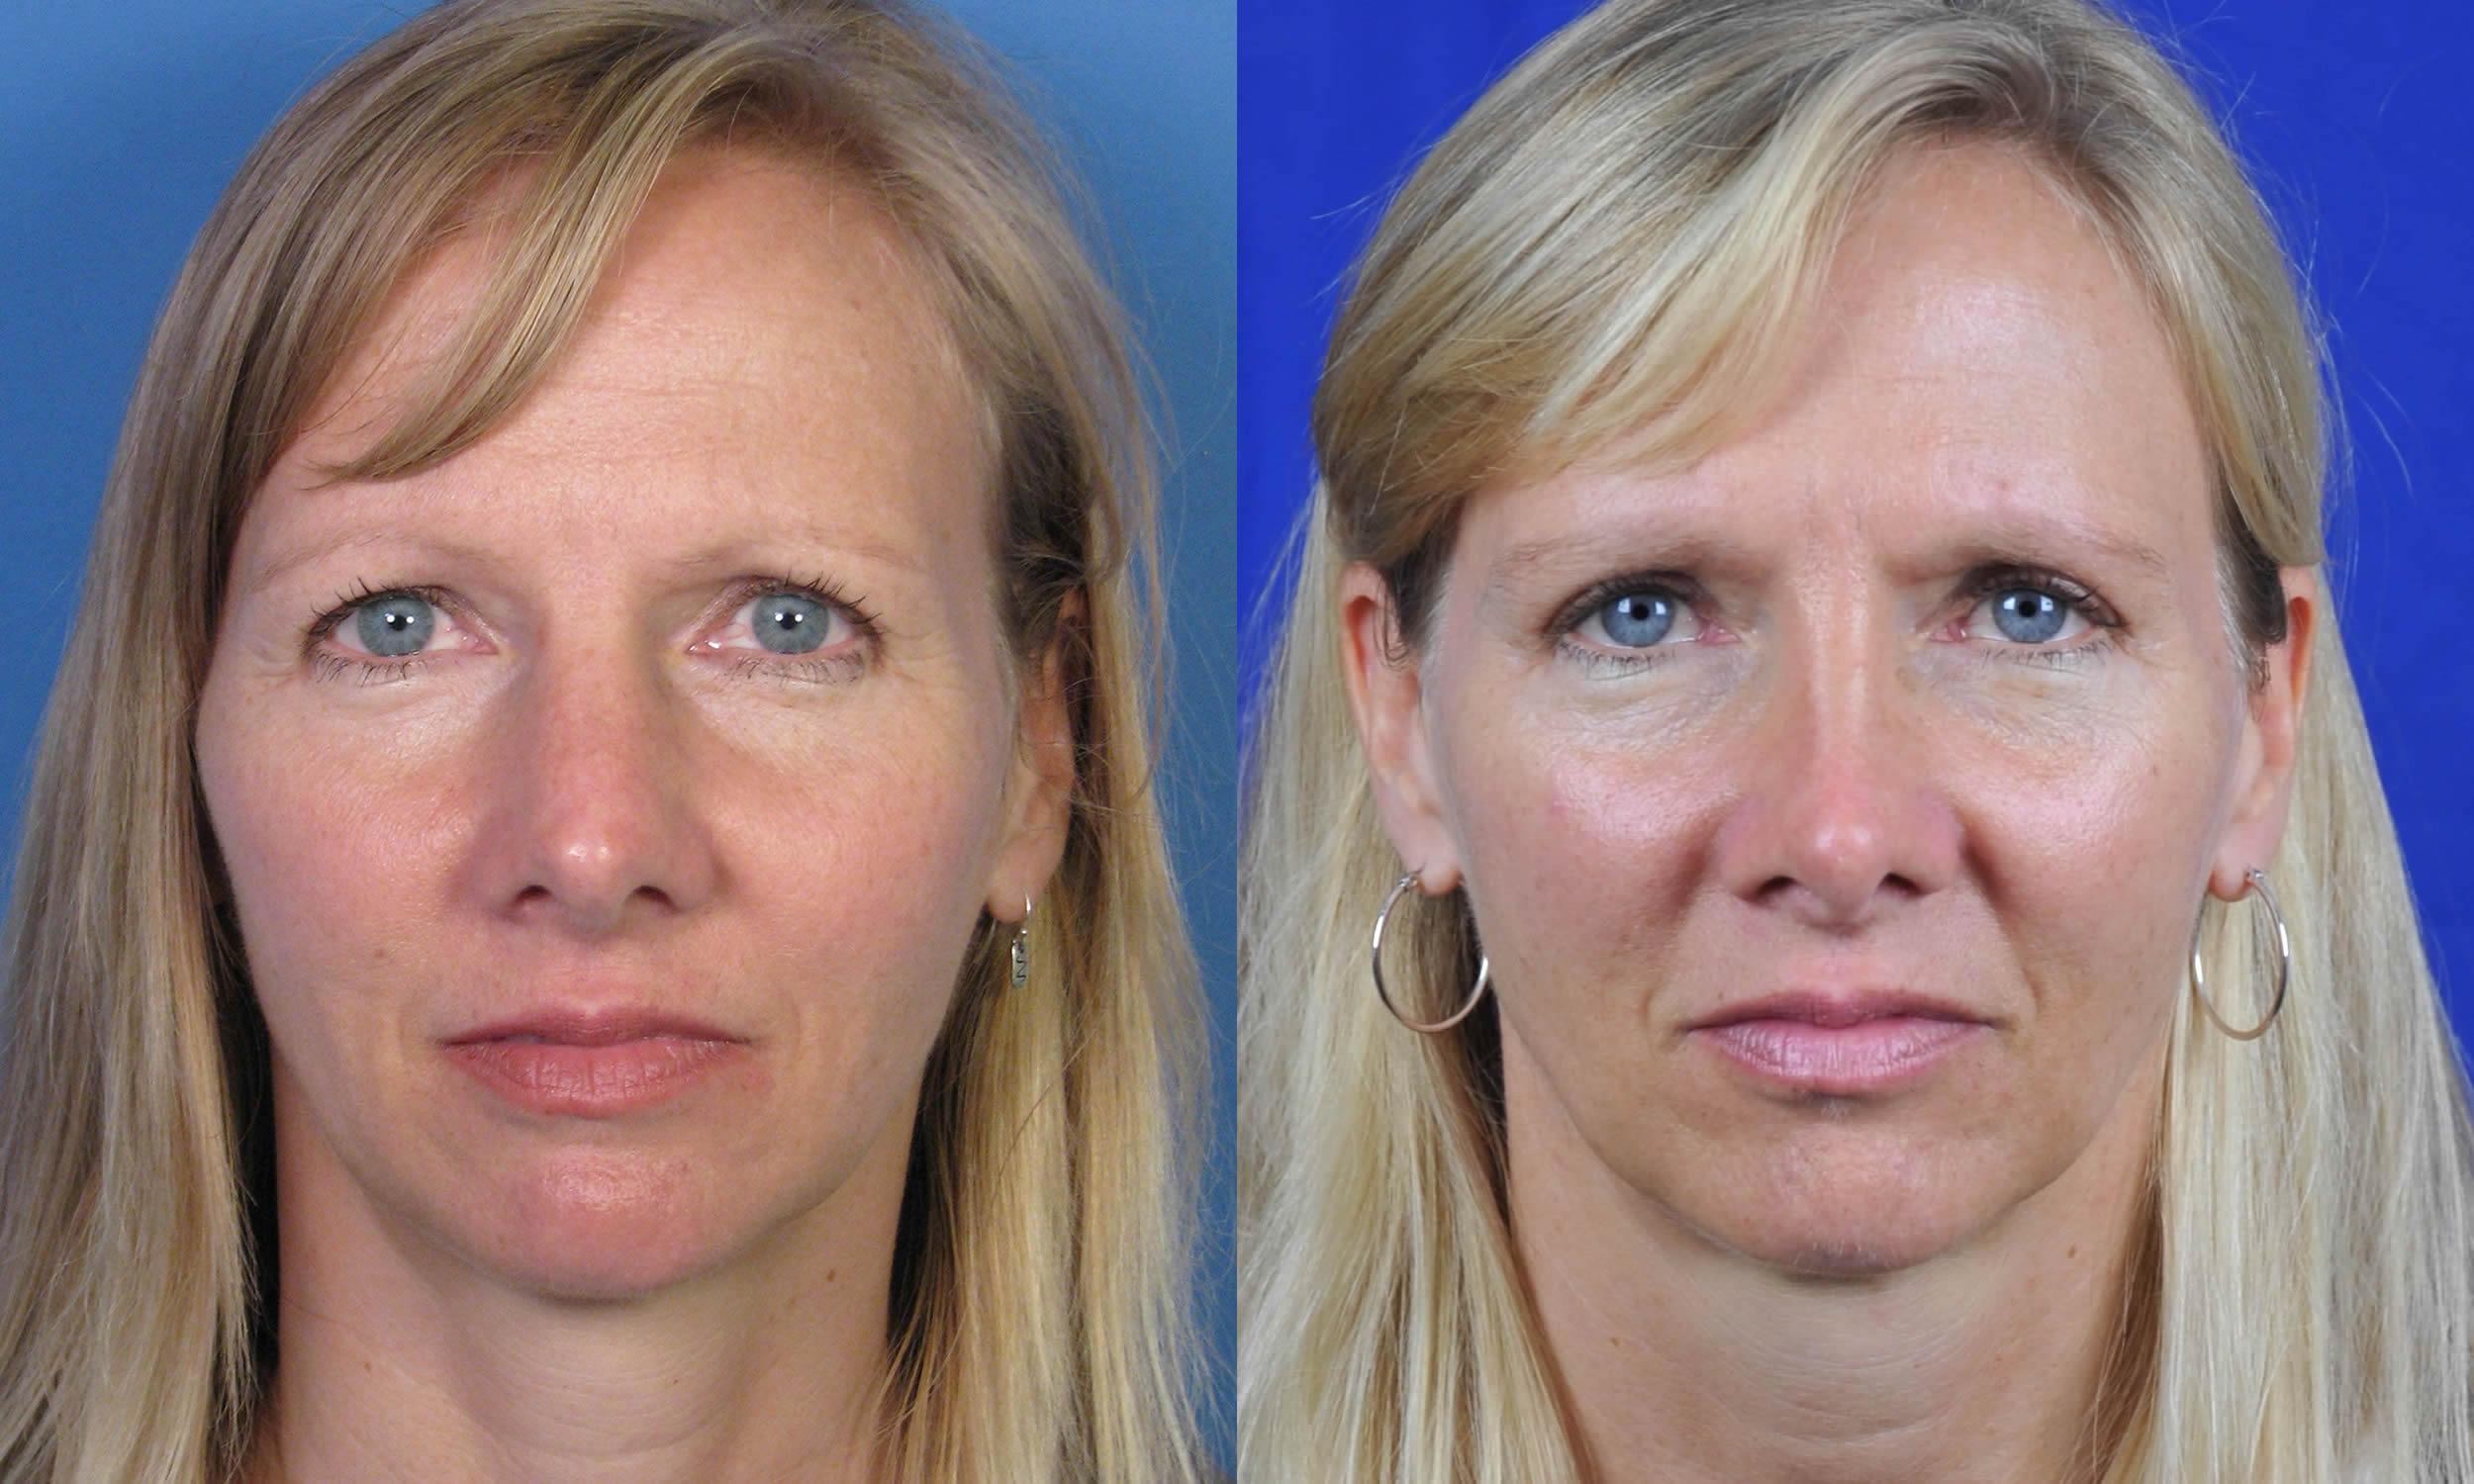 Osteotomies Narrowing A Wide Nasal Bridge